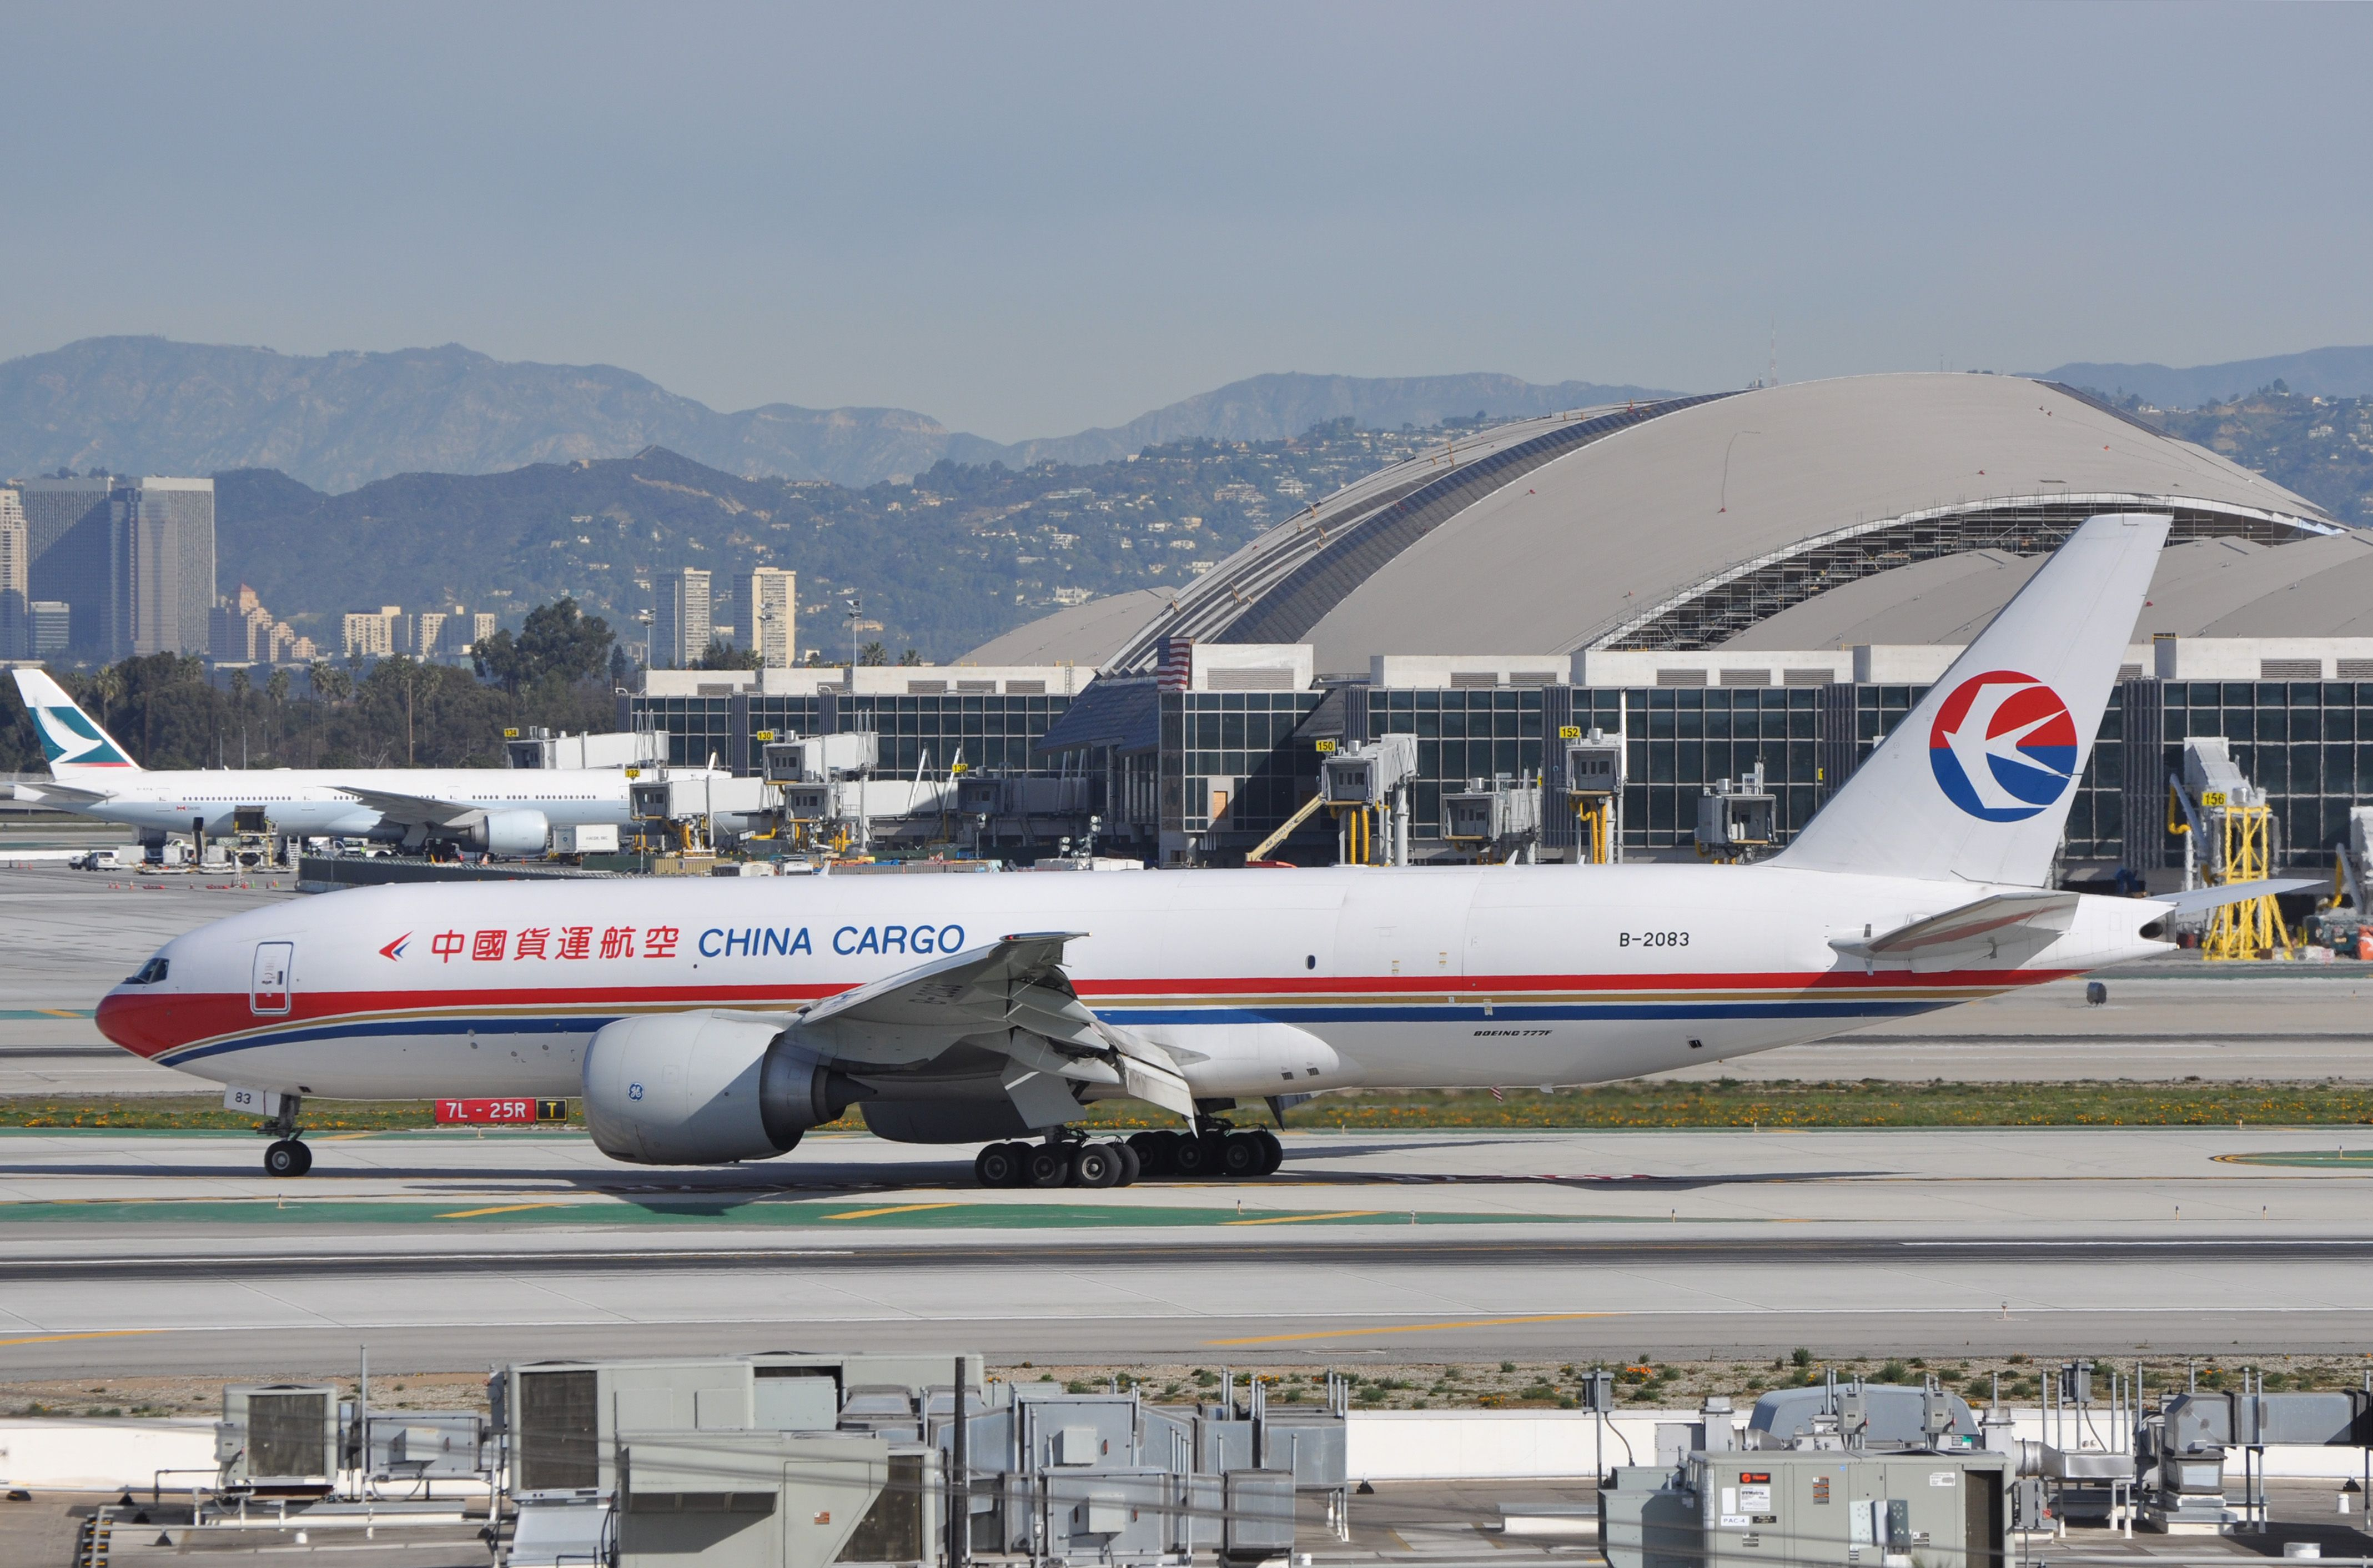 I like the 777200LR/F. Fortunately, LAX gets their fair